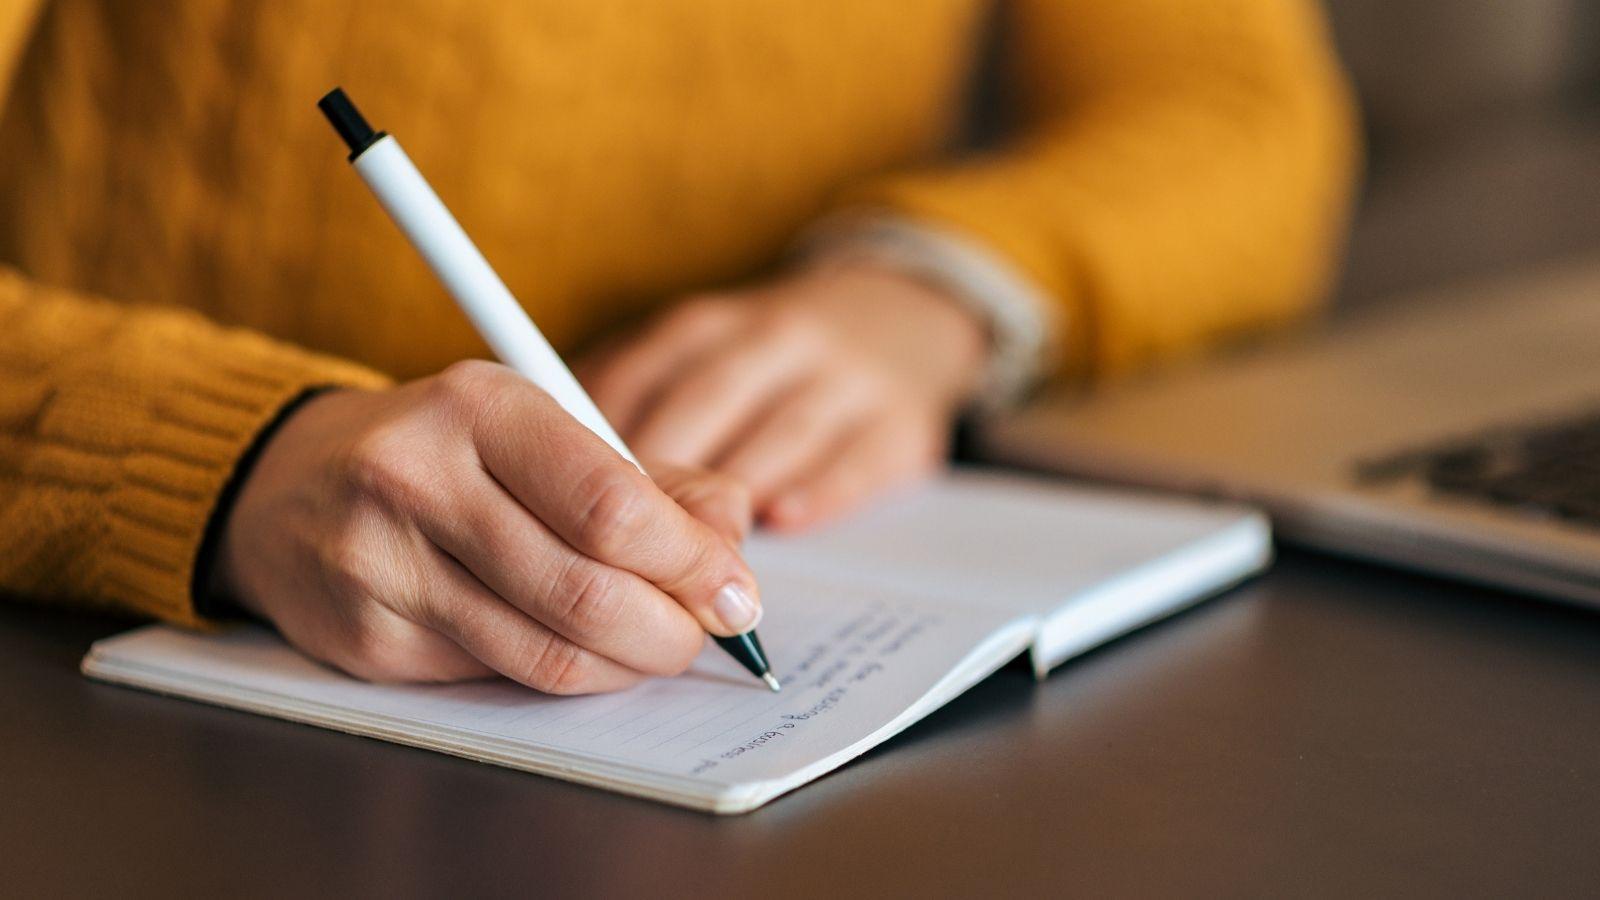 7 Essential Rules for SEO Copywriting